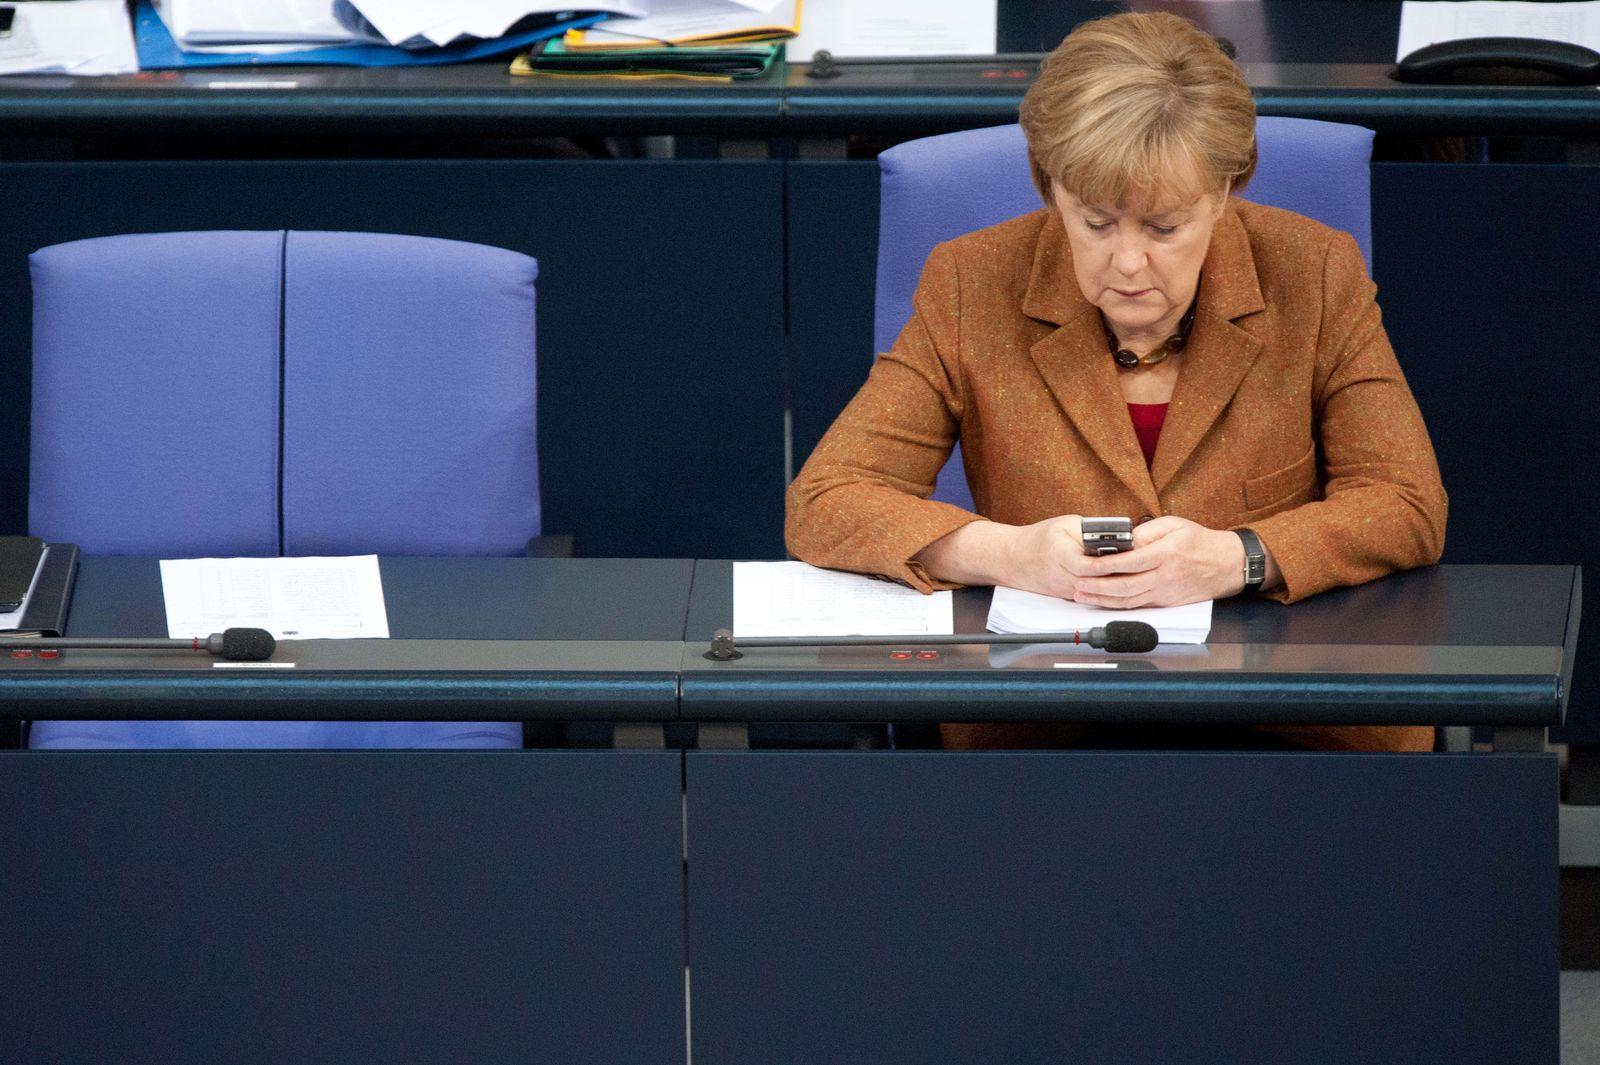 Kanzlerjob/ Merkel/ Telefon